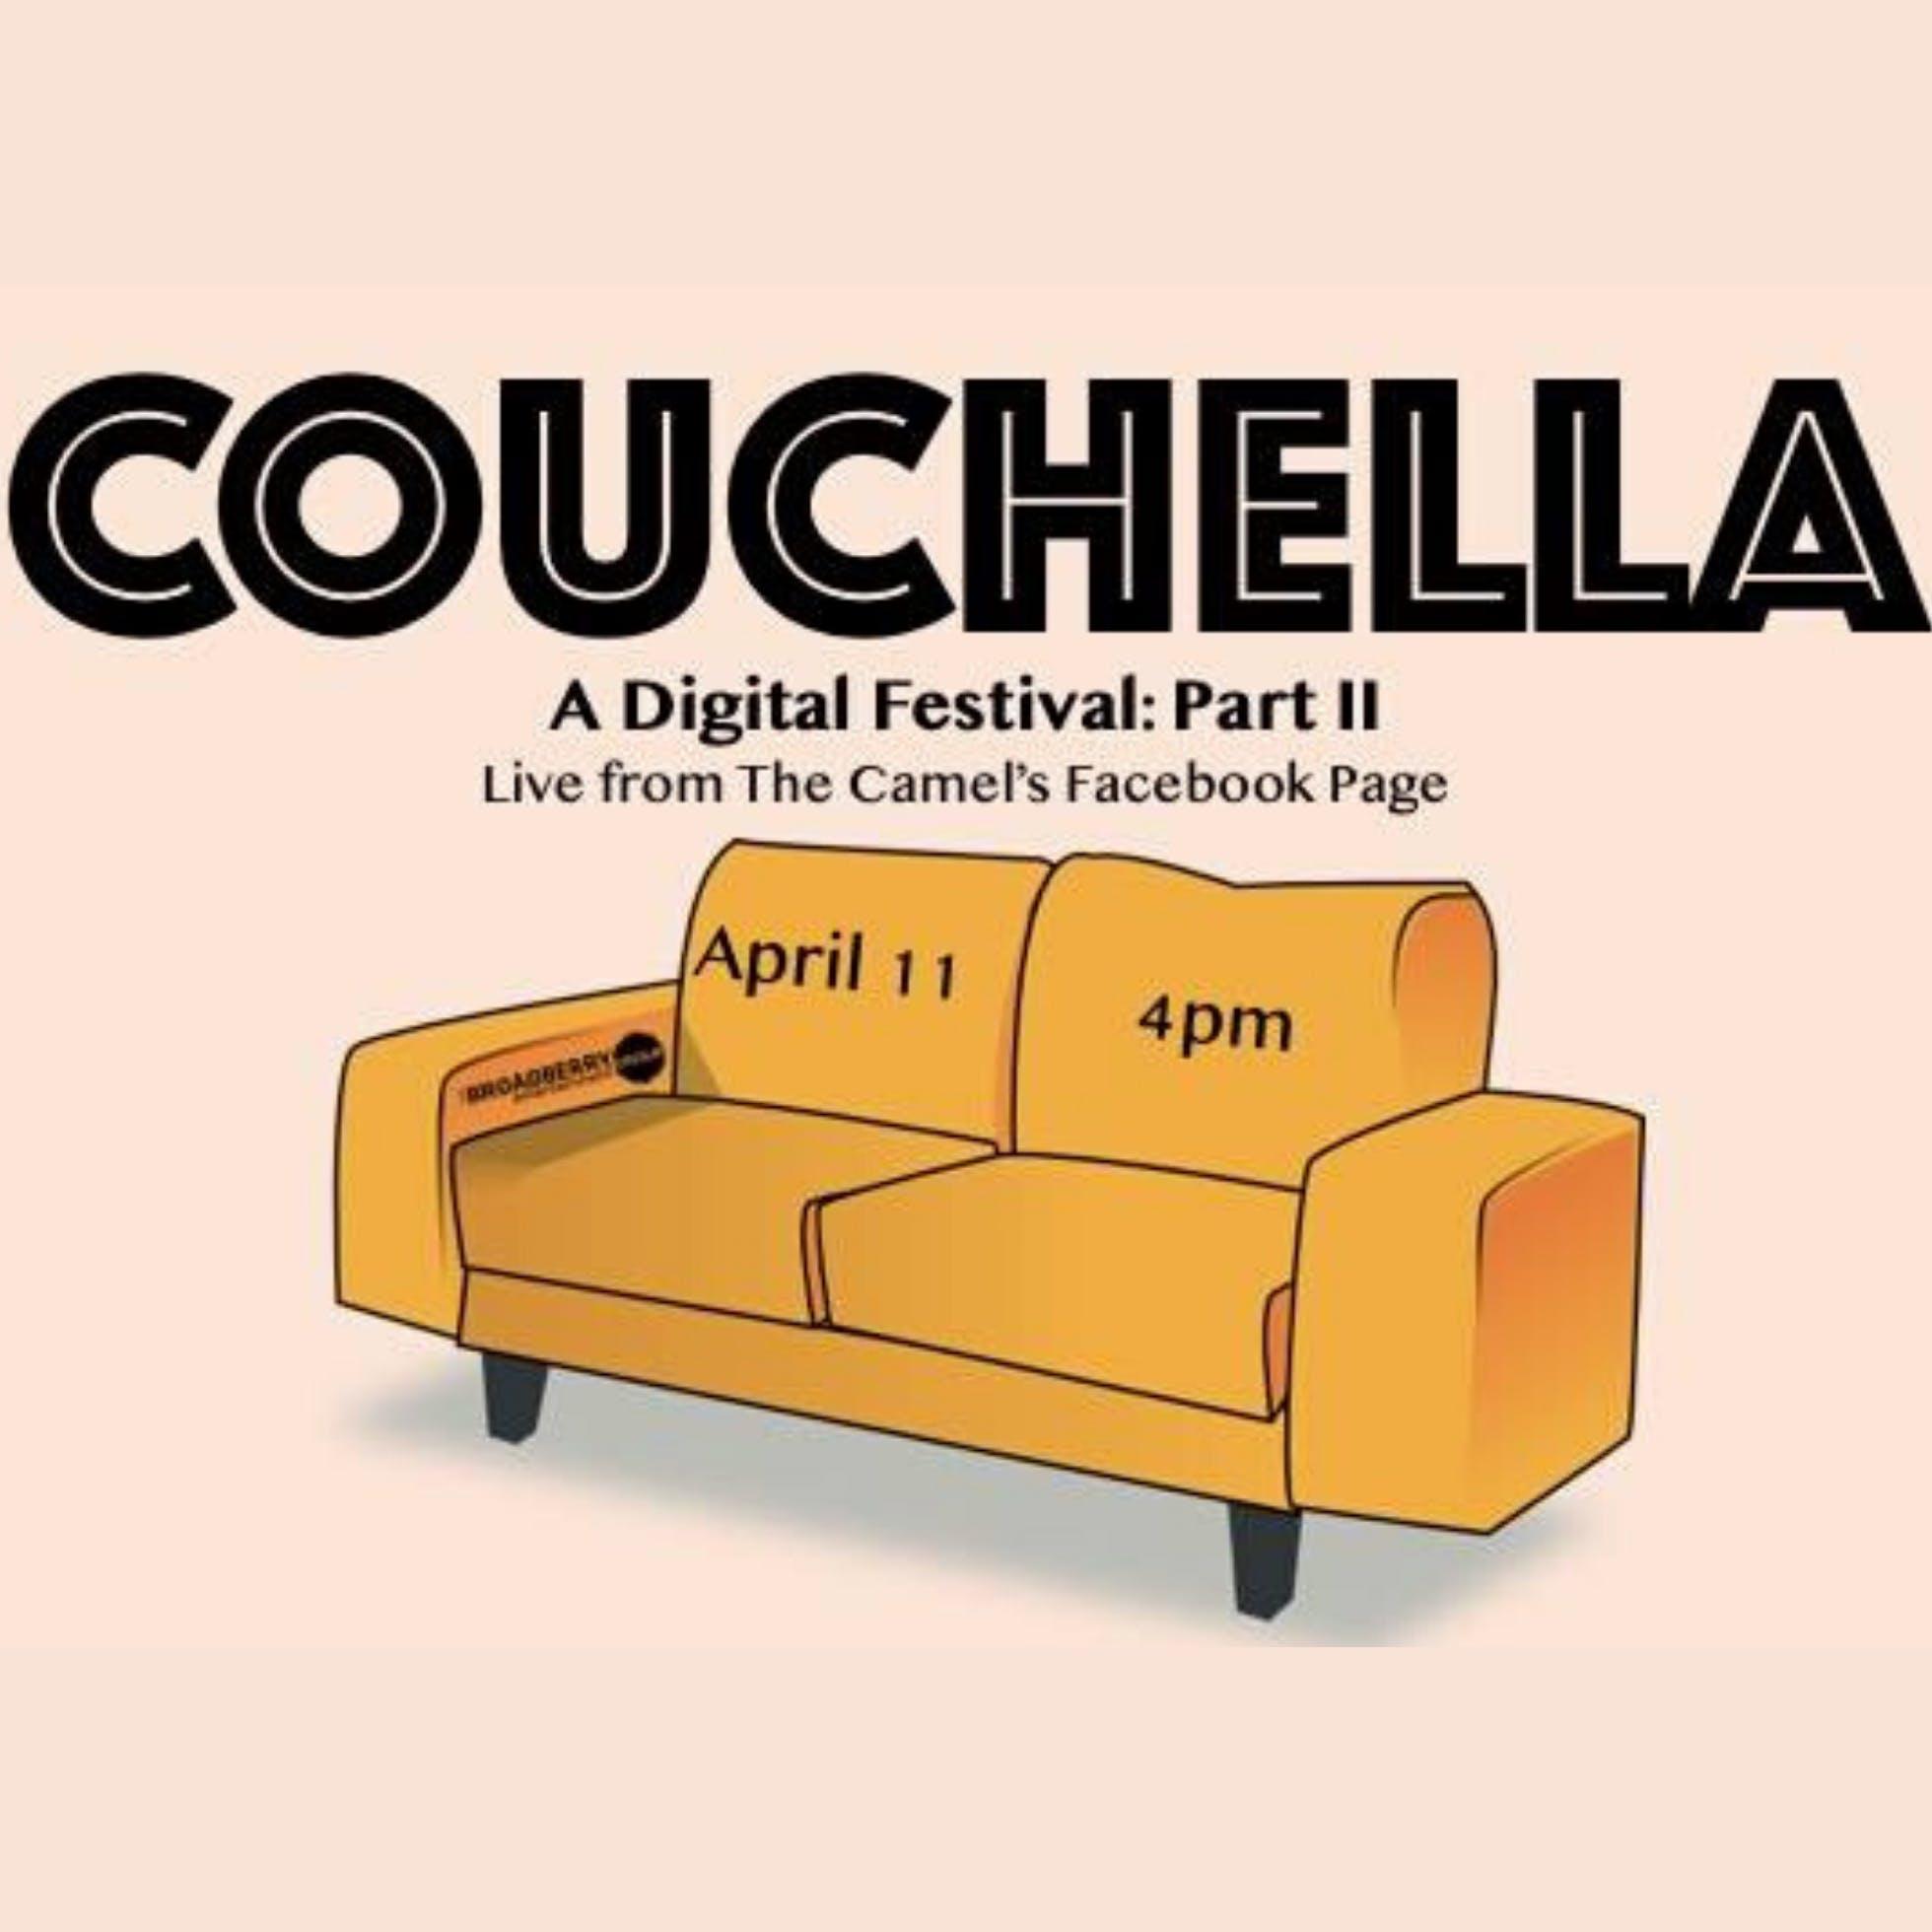 Couchella: A Free Digital Festival